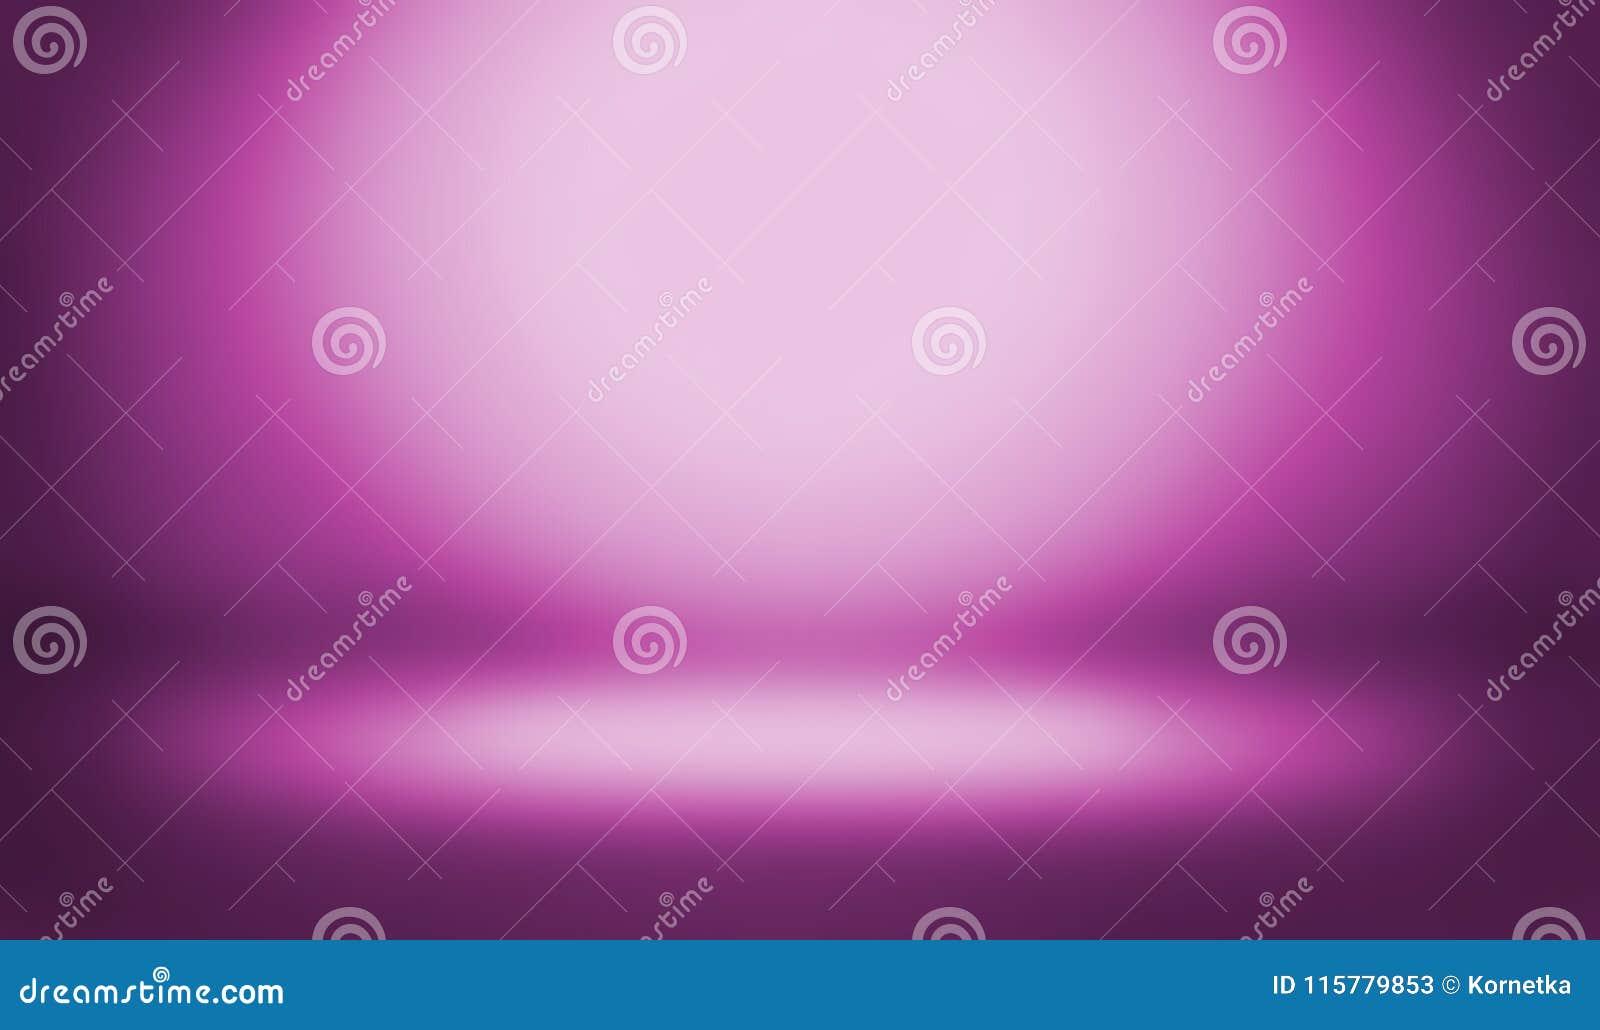 Kolor tła abstrakcyjne puści izbowi studia well use jako backdr